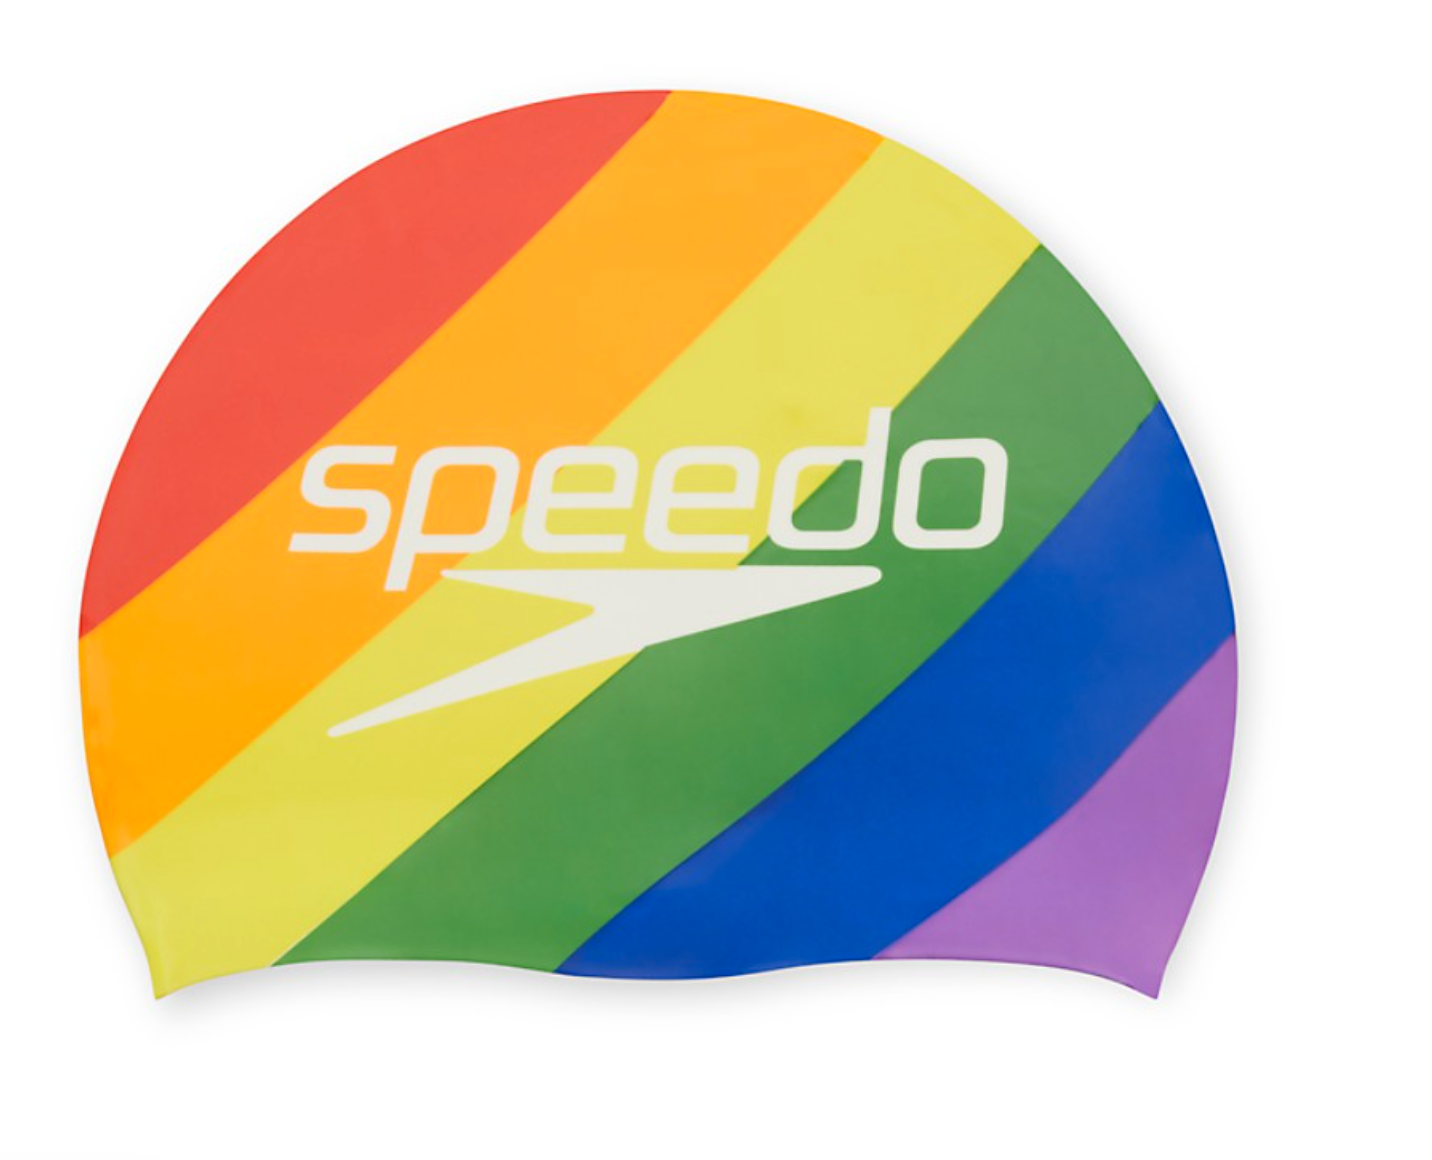 SPEEDO Speedo Printed Silicone Swim Cap